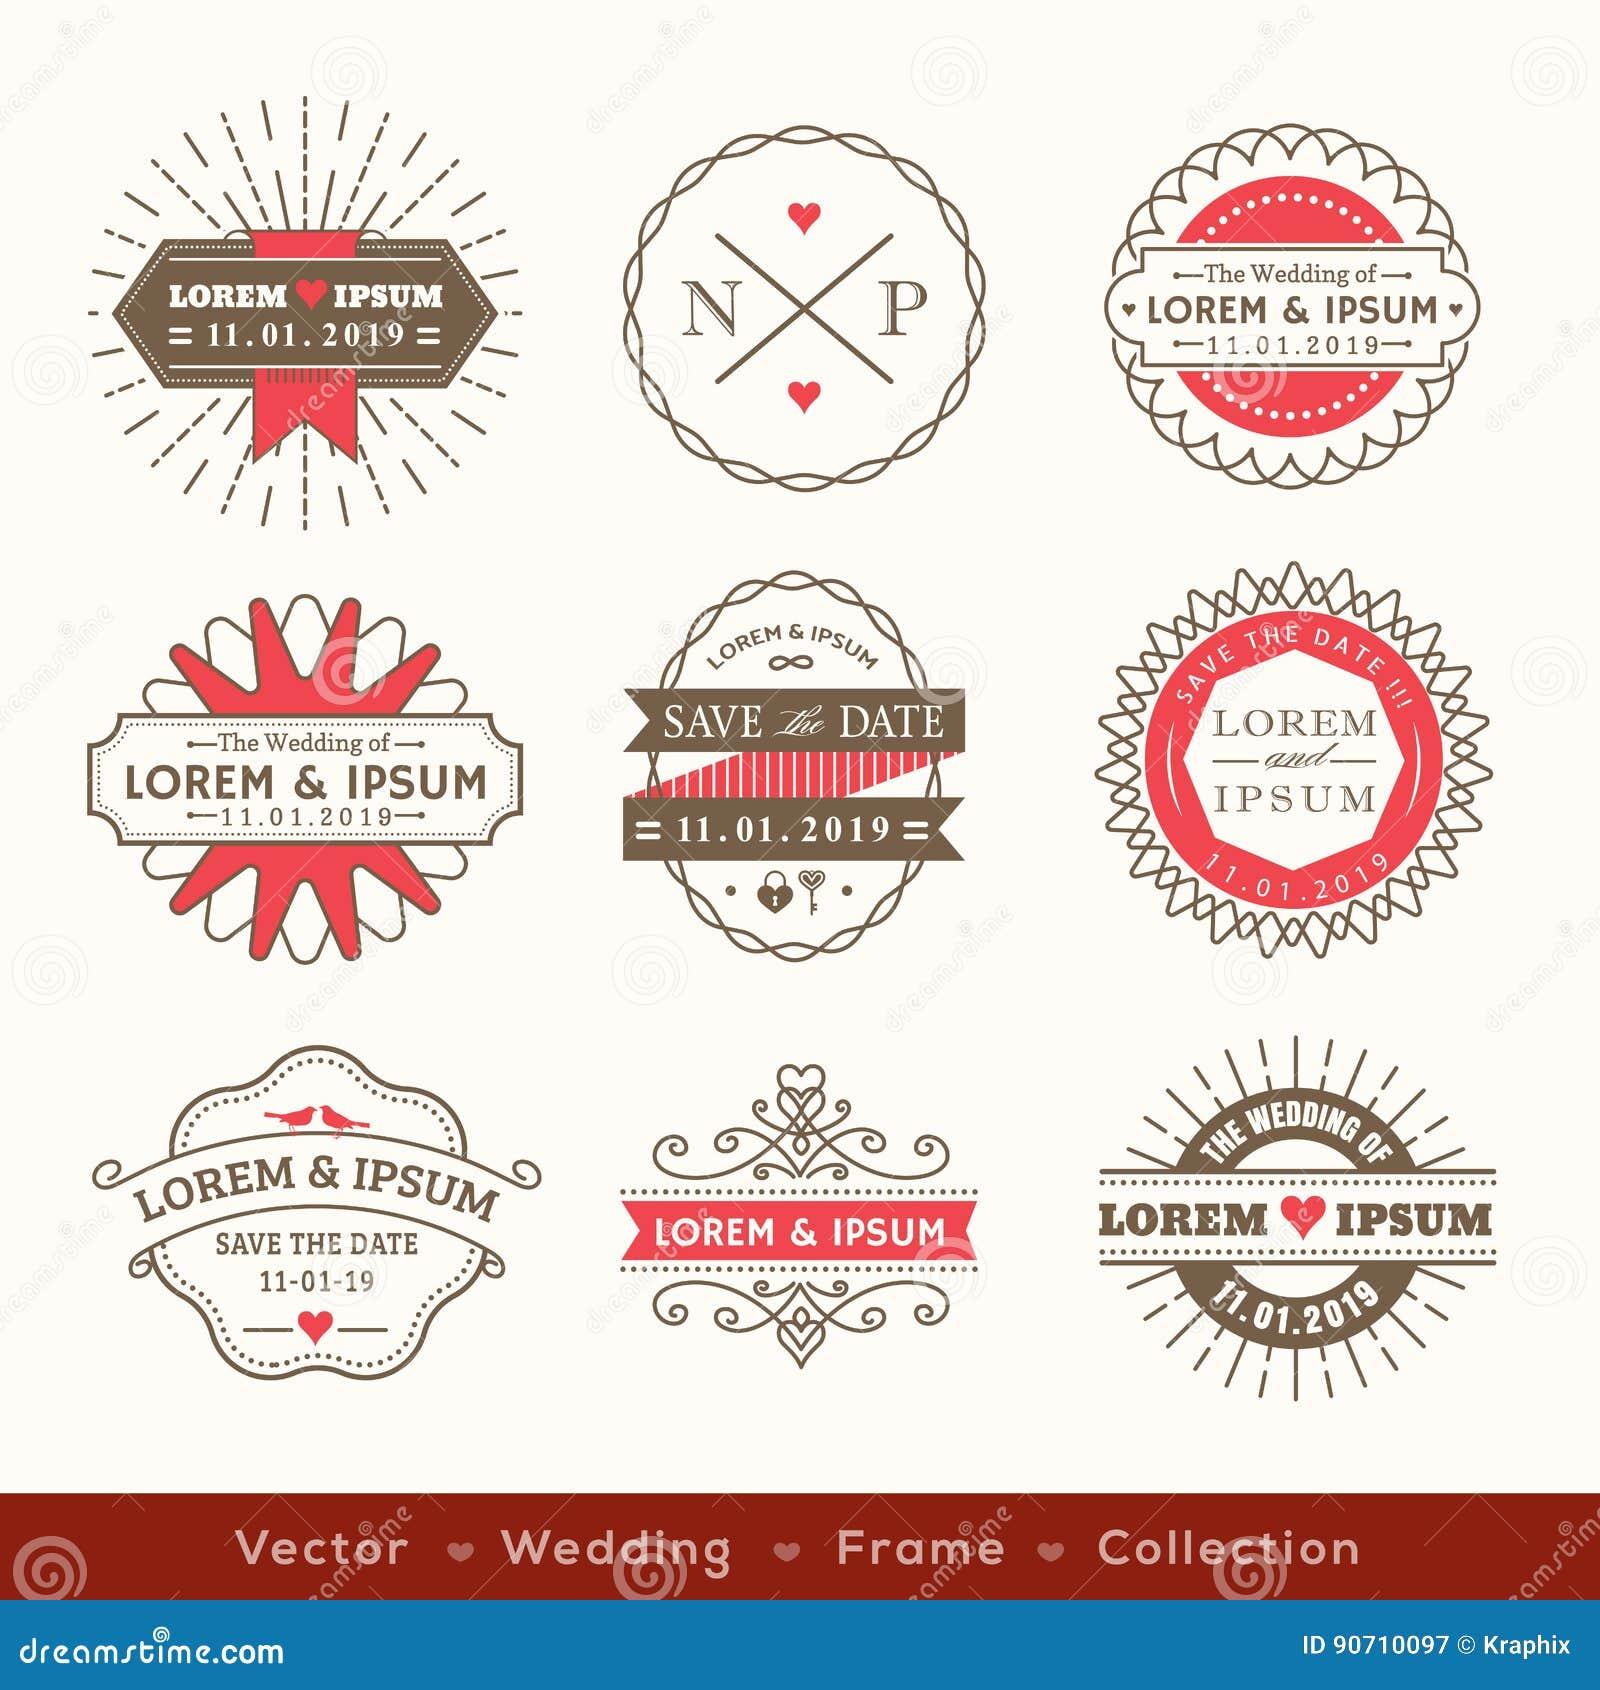 91 wedding logo design free download retro modern hipster wedding